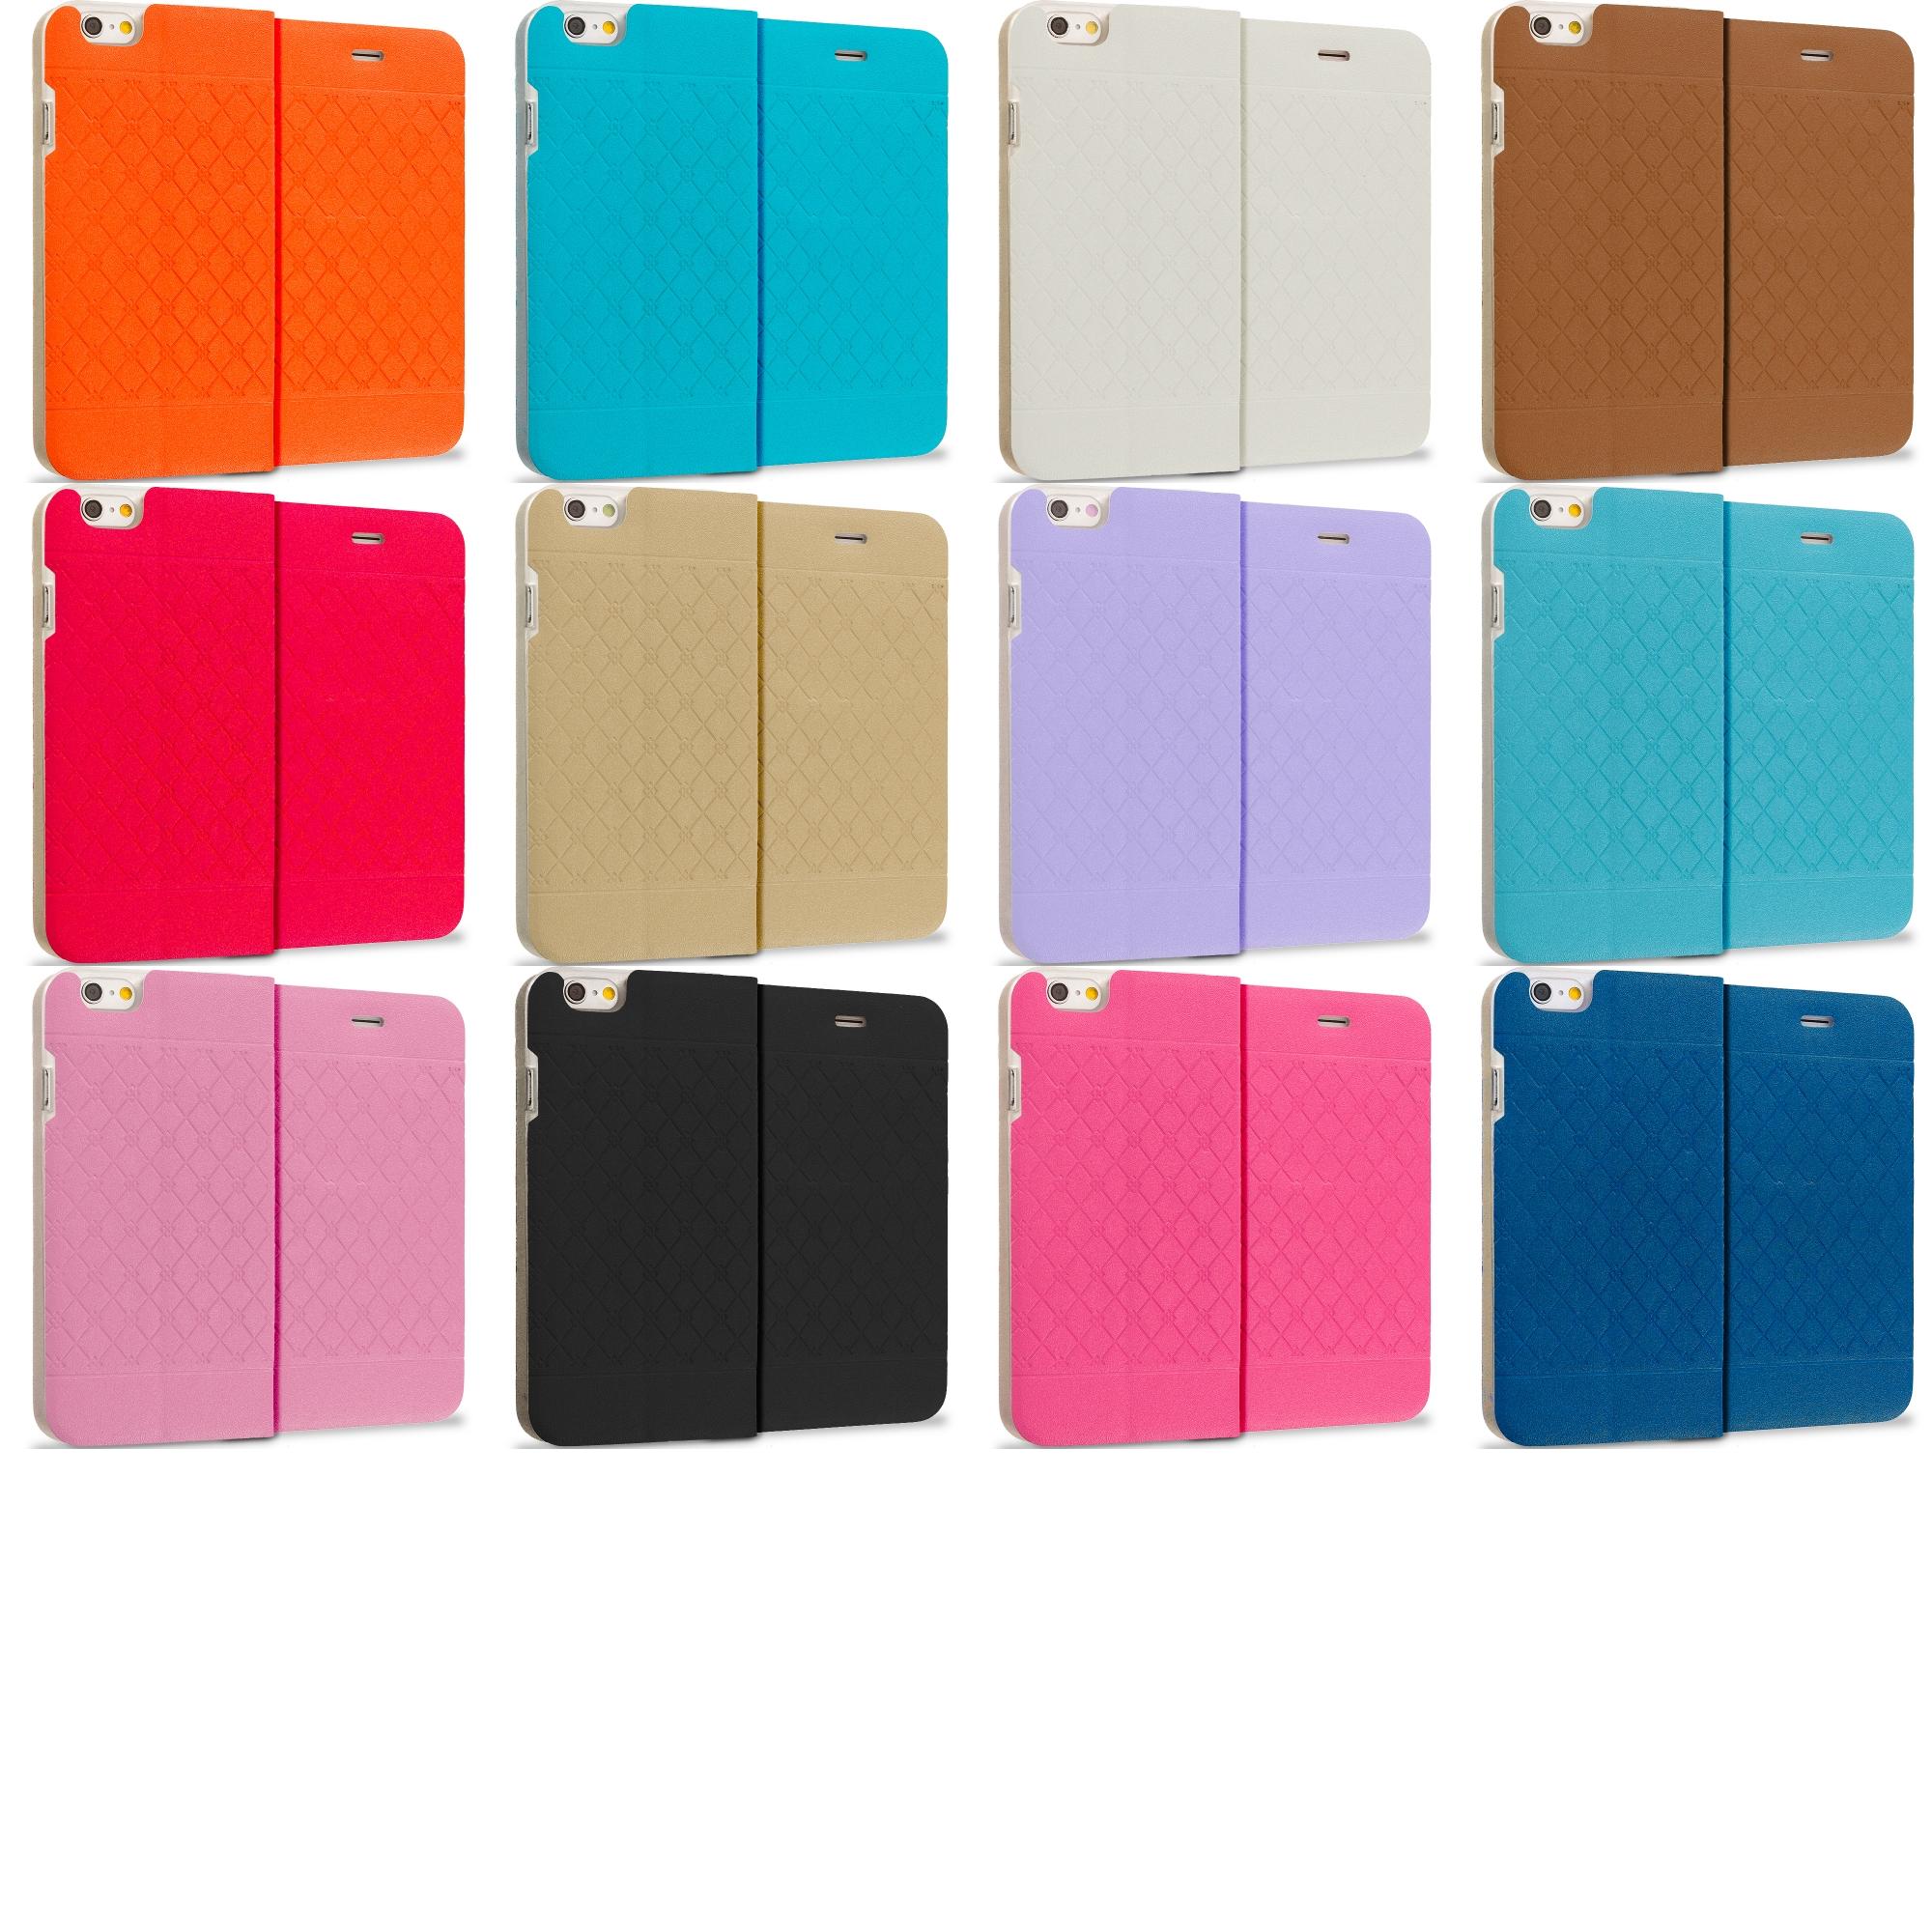 Apple iPhone 6 6S (4.7) 12 in 1 Combo Bundle Pack - Slim Wallet Plaid Luxury Design Flip Case Cover